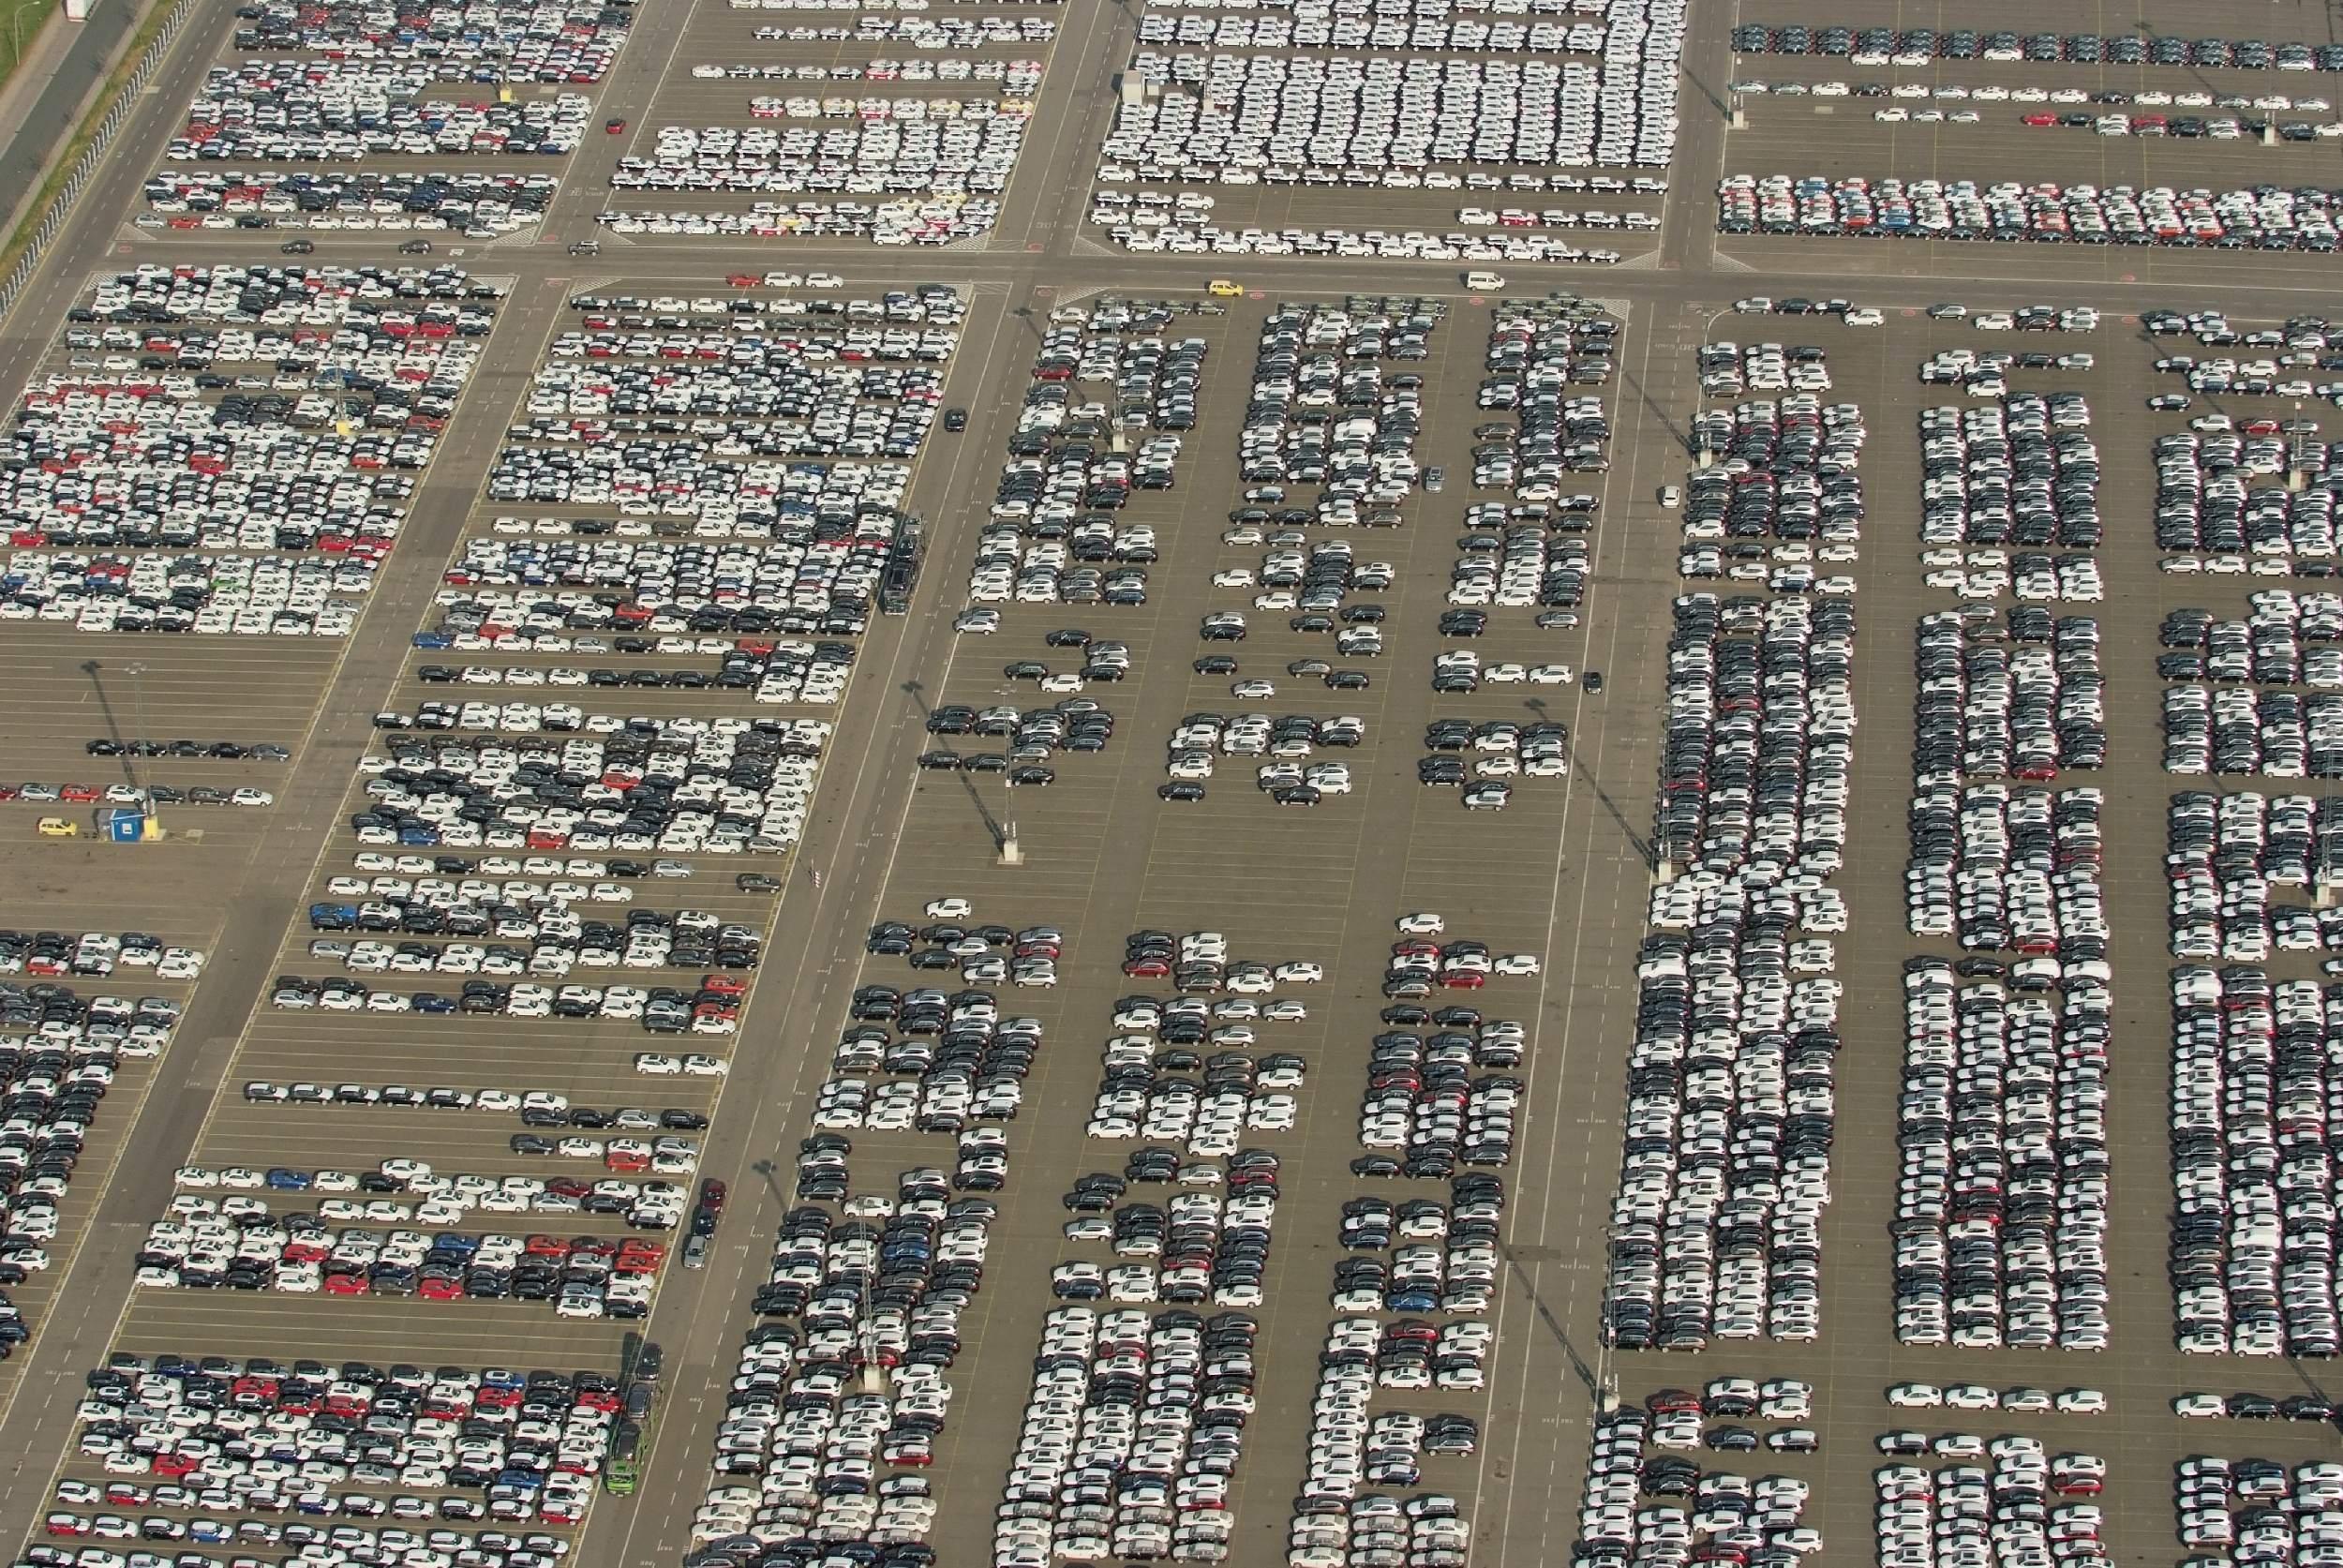 Automobilindustrie - Export-Terminal in Bremerhaven